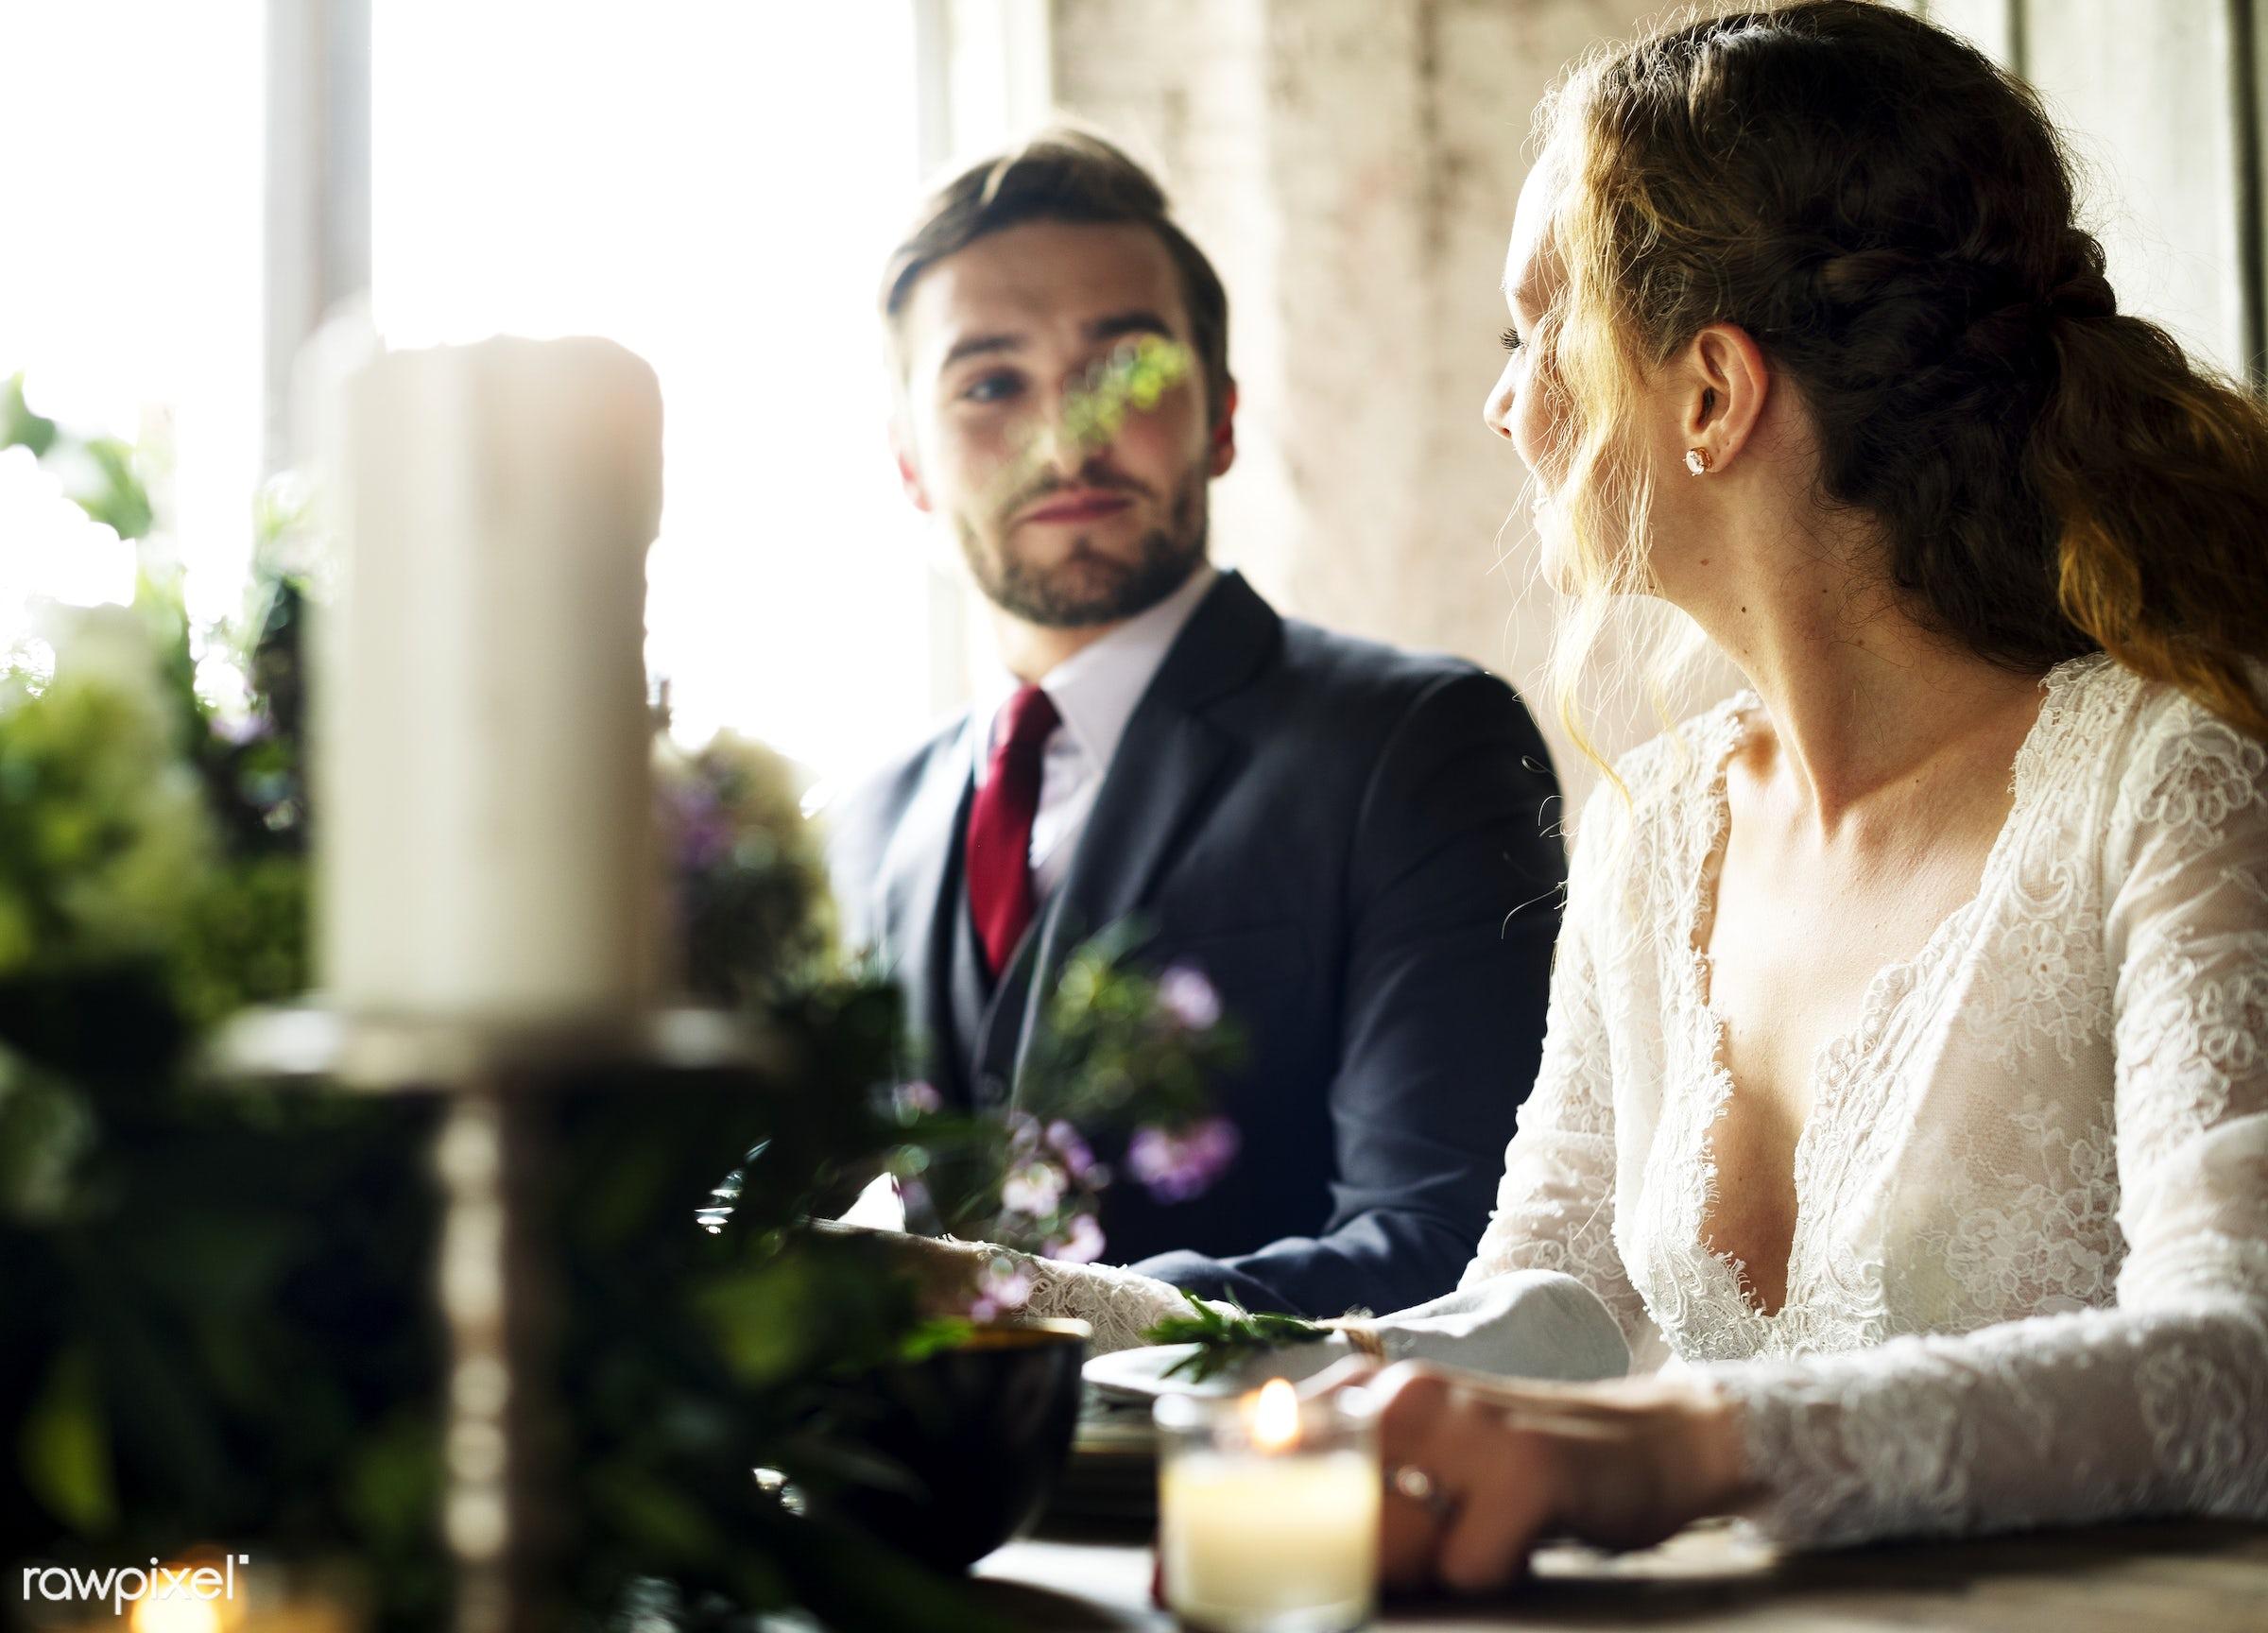 adult, bridal, bride, celebrate, celebration, cheerful, couple, enjoyment, event, expression, family, female, friends,...